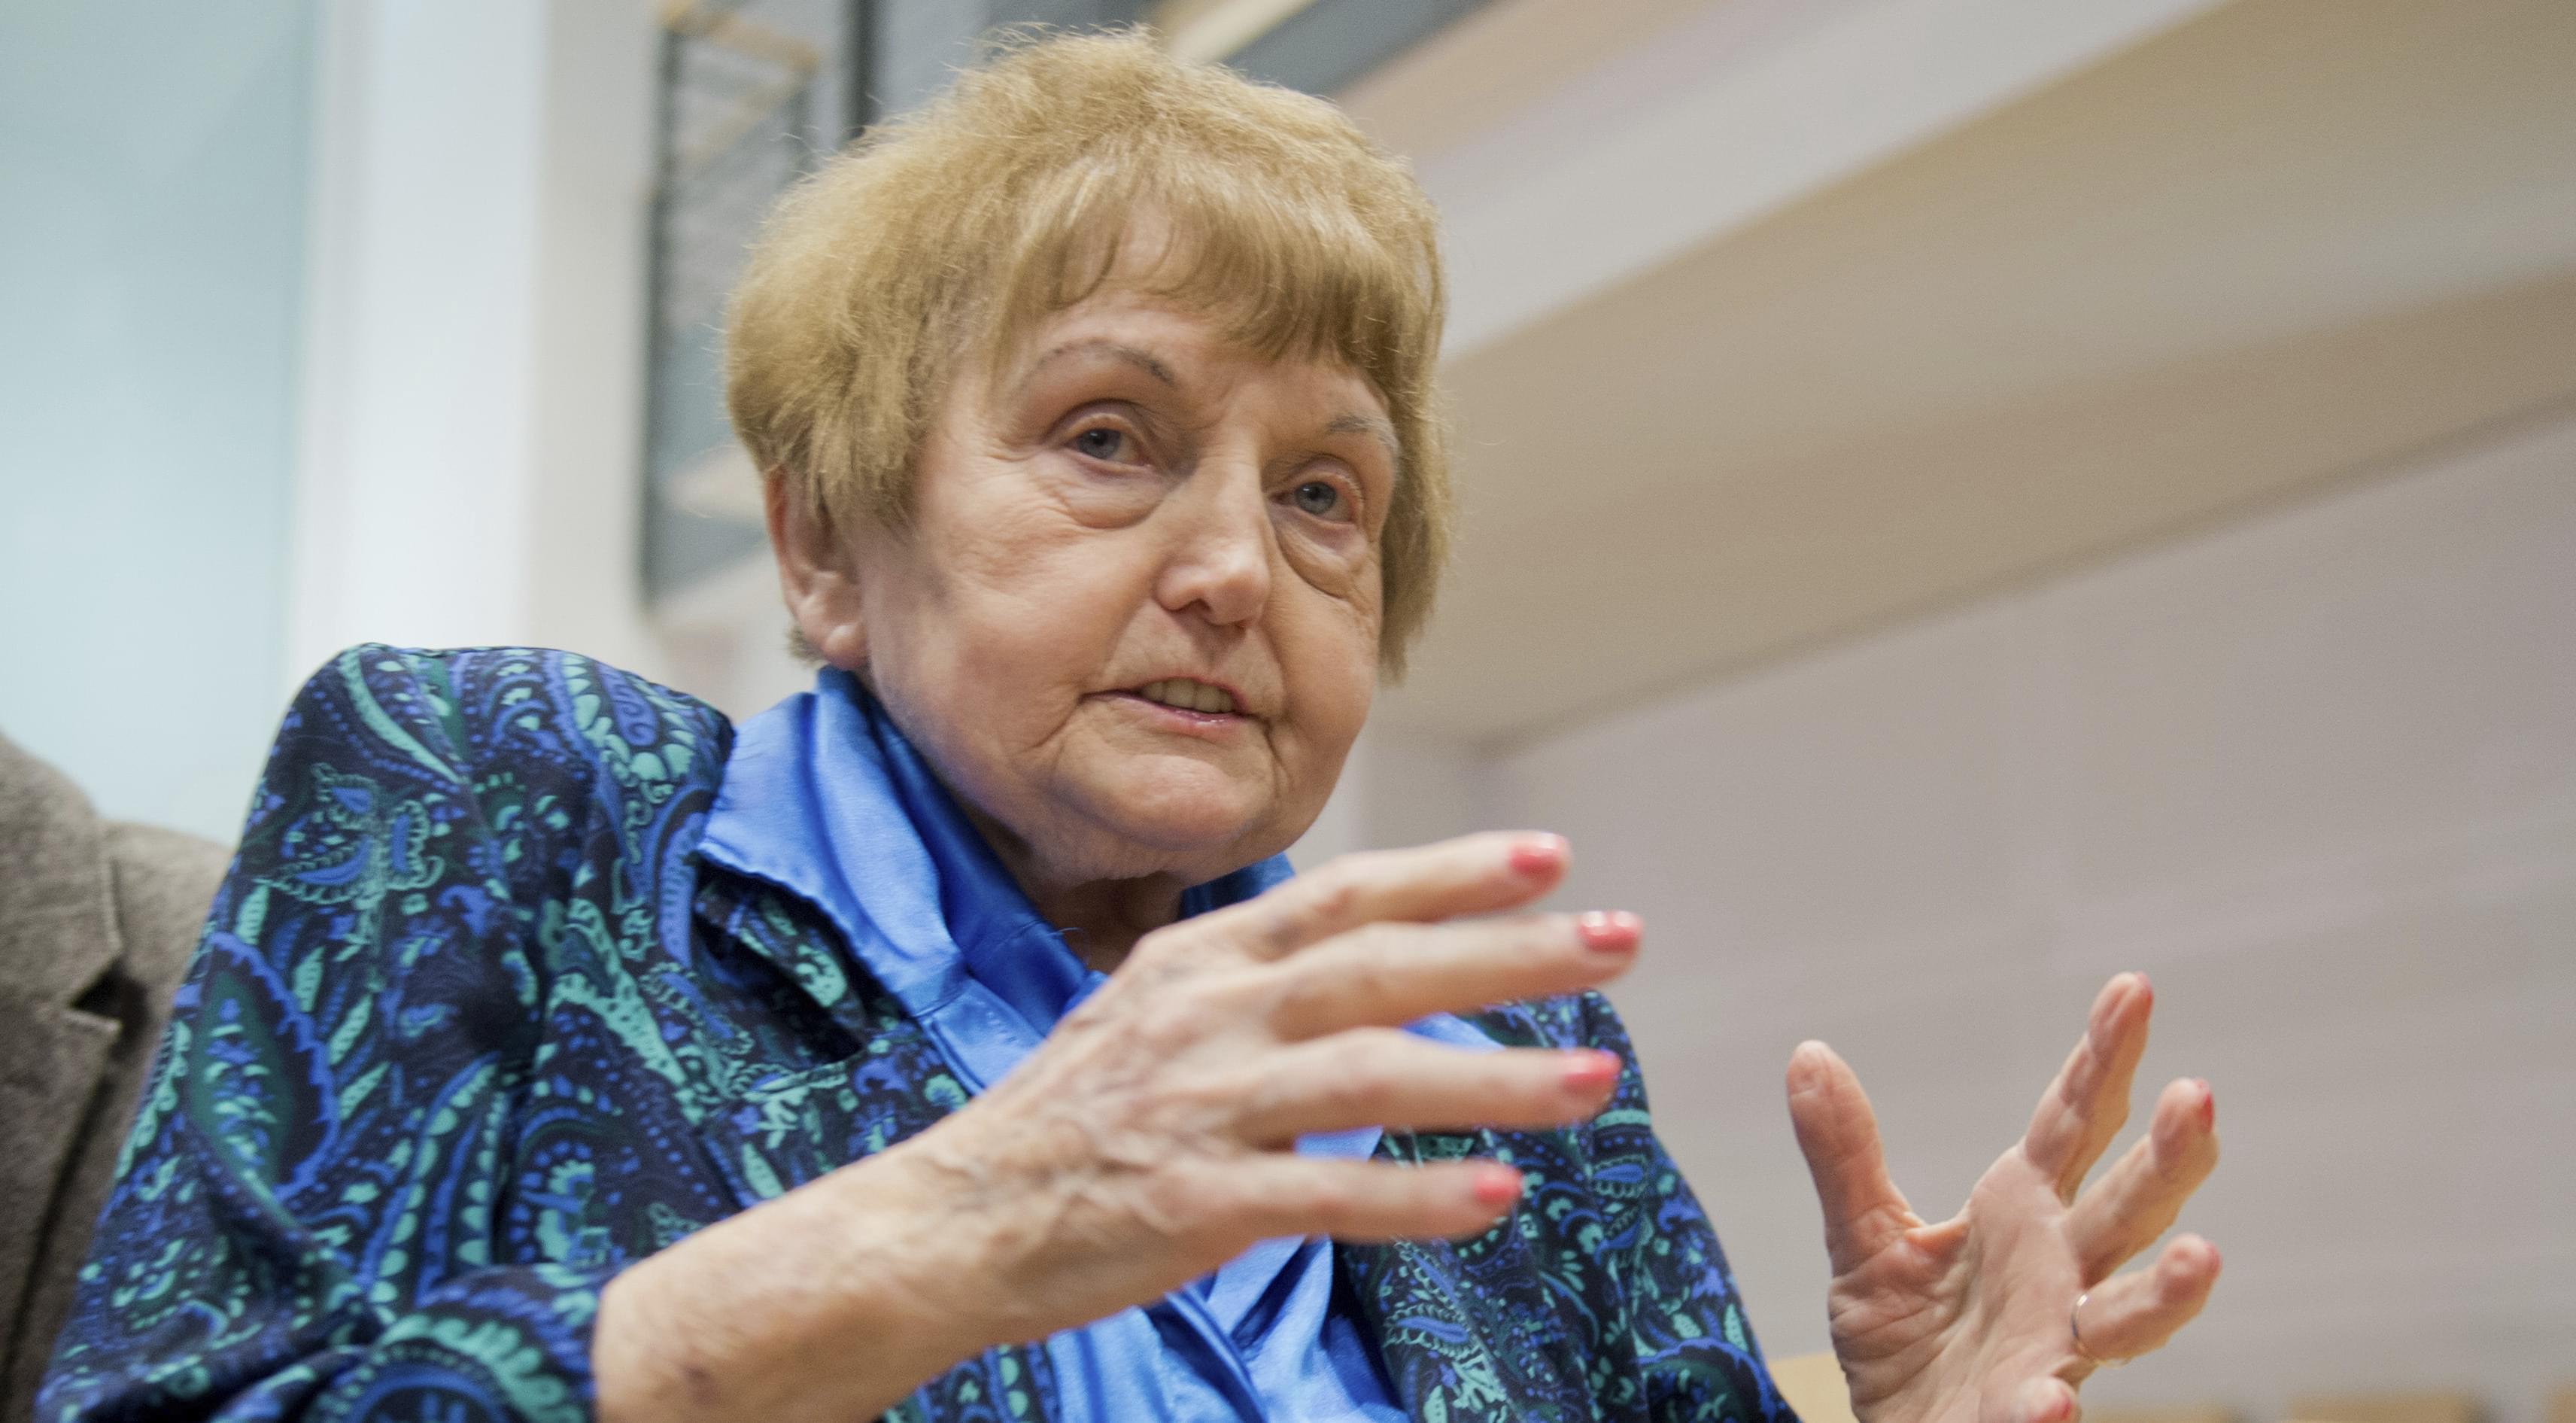 Holocaust survivor Eva Kor